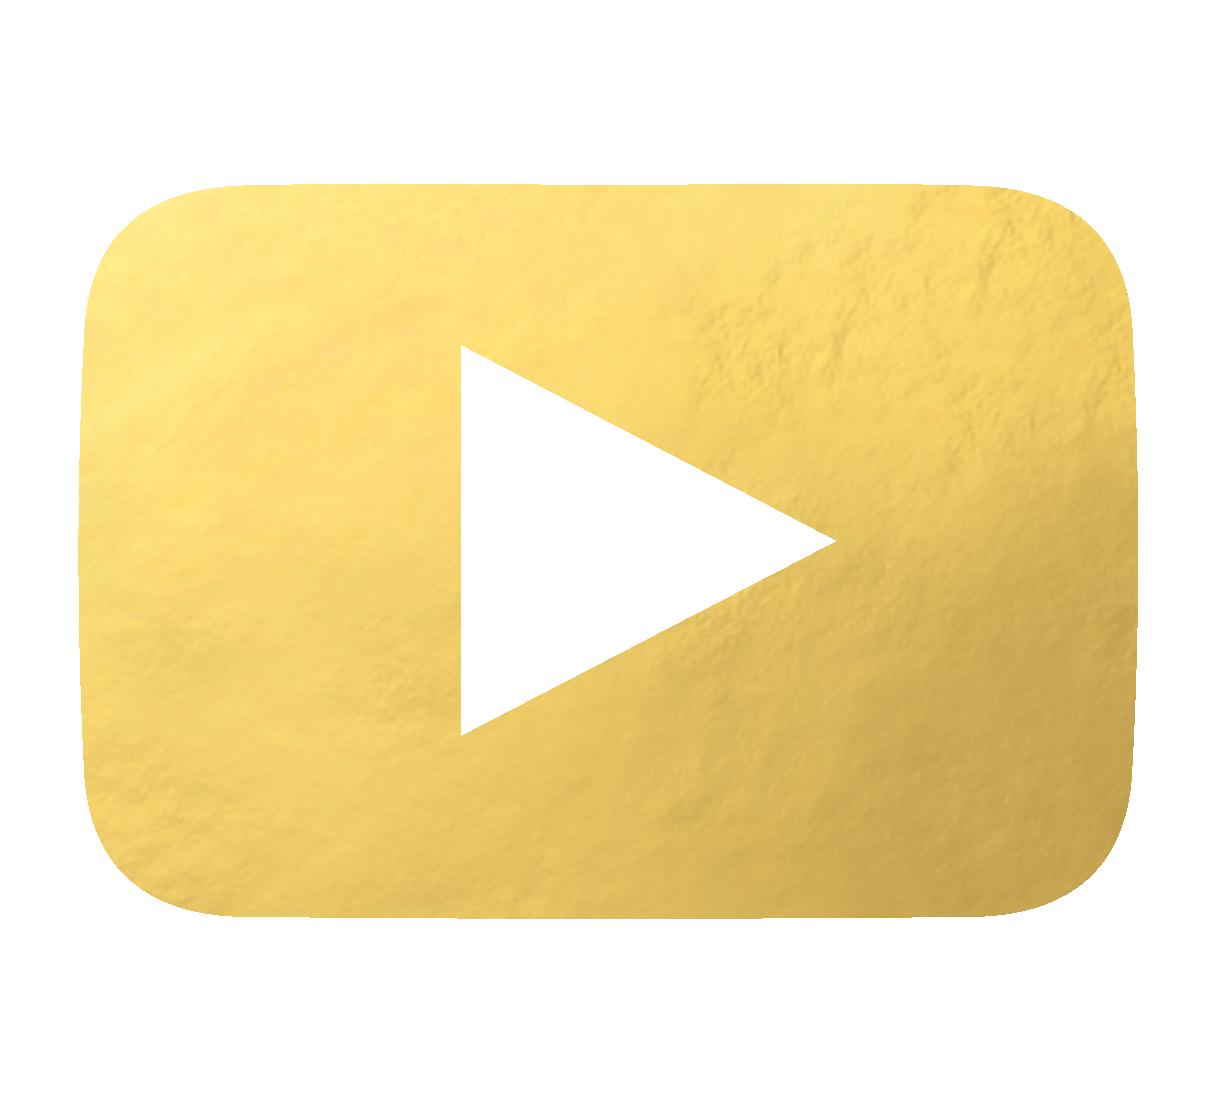 gold-foil-social-media-5-.png